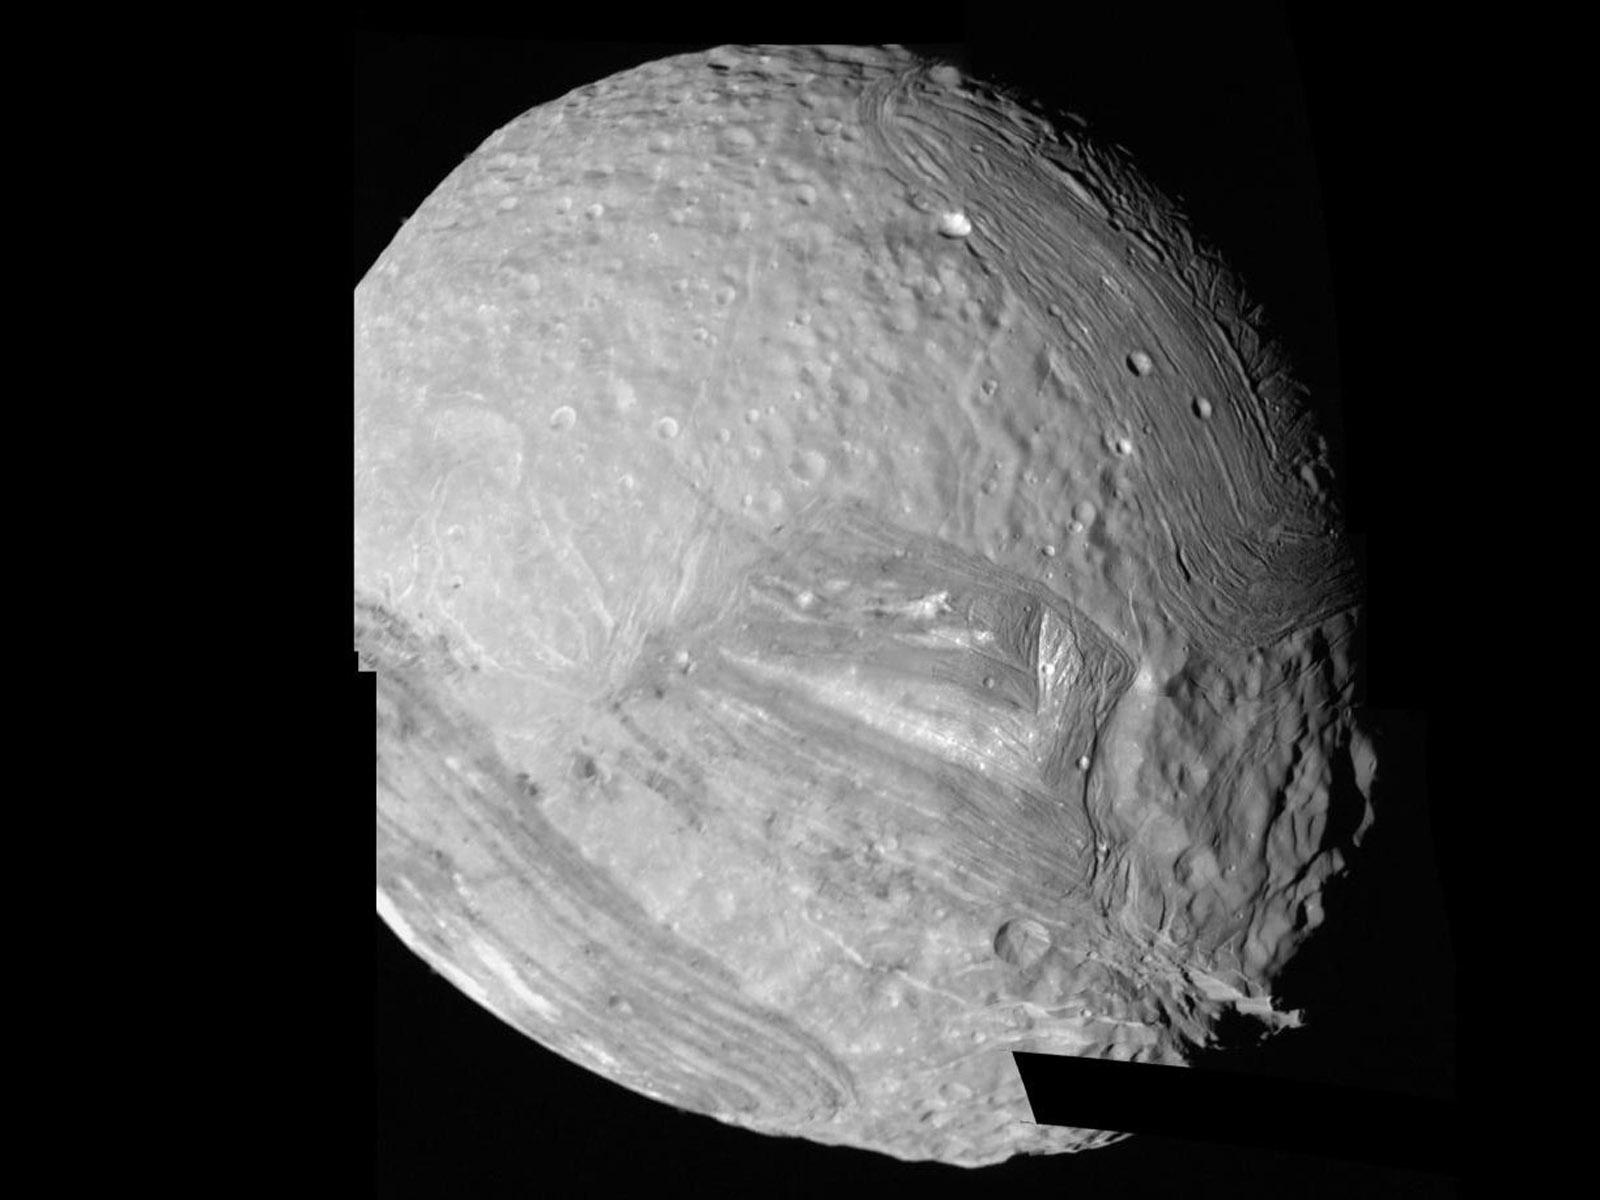 uranus moon bianca - photo #17